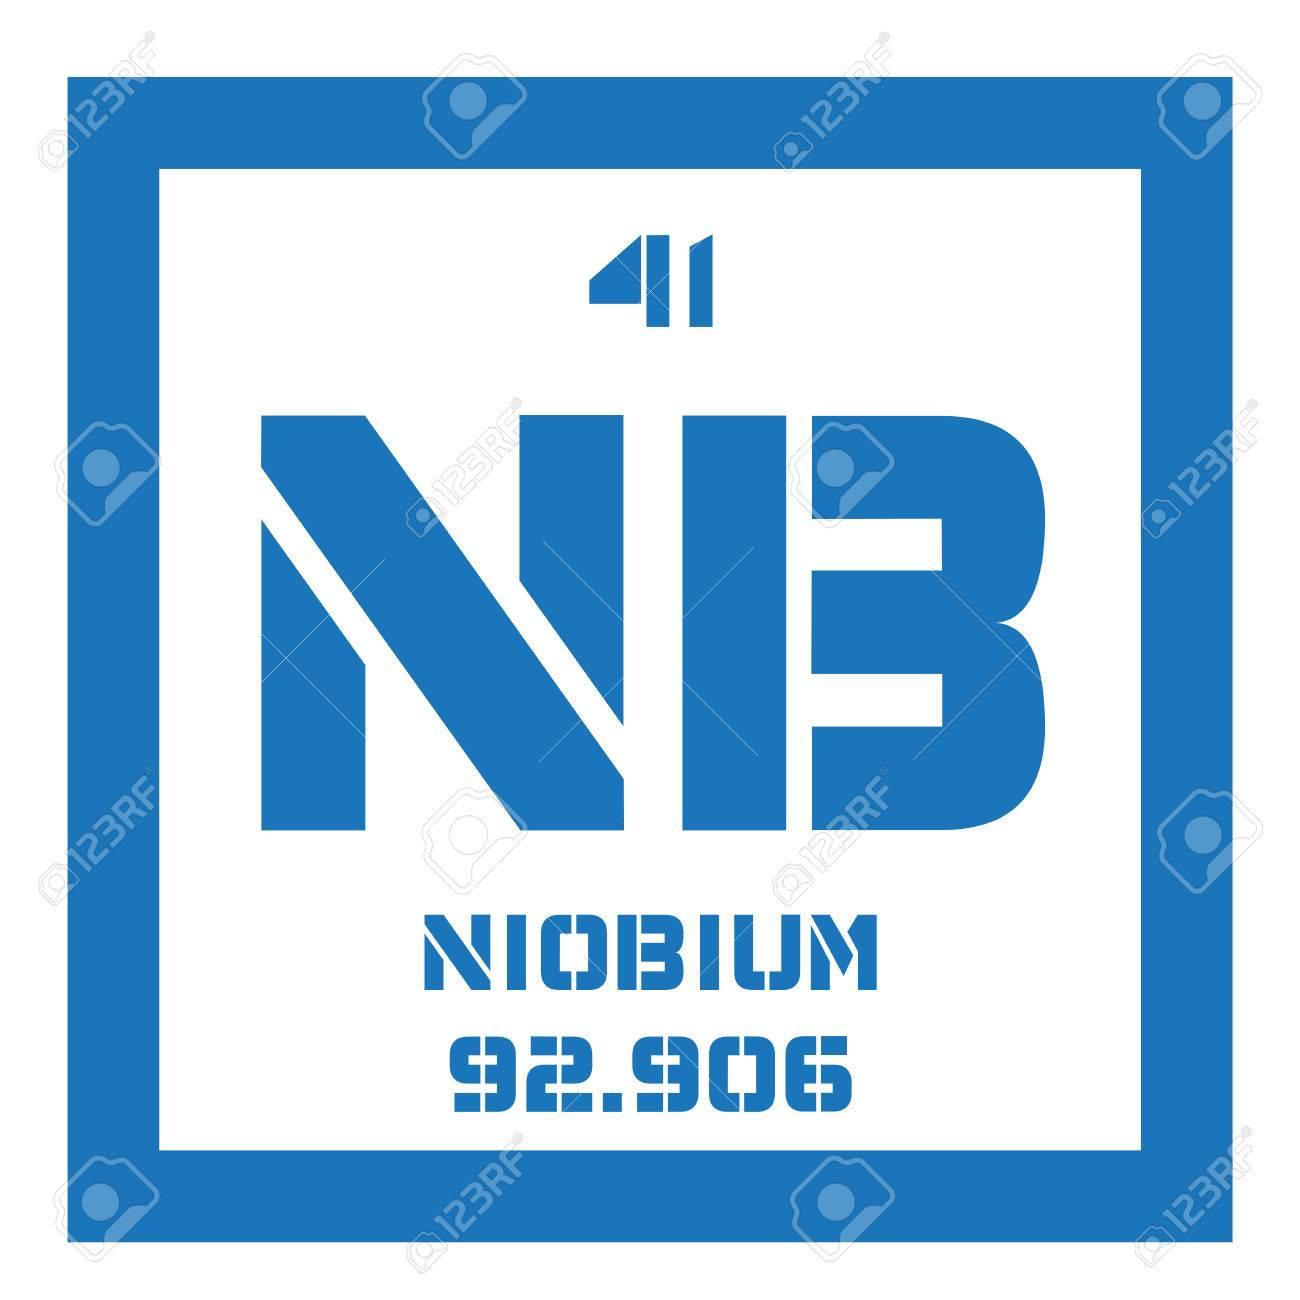 Niobium chemical element niobium is a transition metal colored niobium chemical element niobium is a transition metal colored icon with atomic number and biocorpaavc